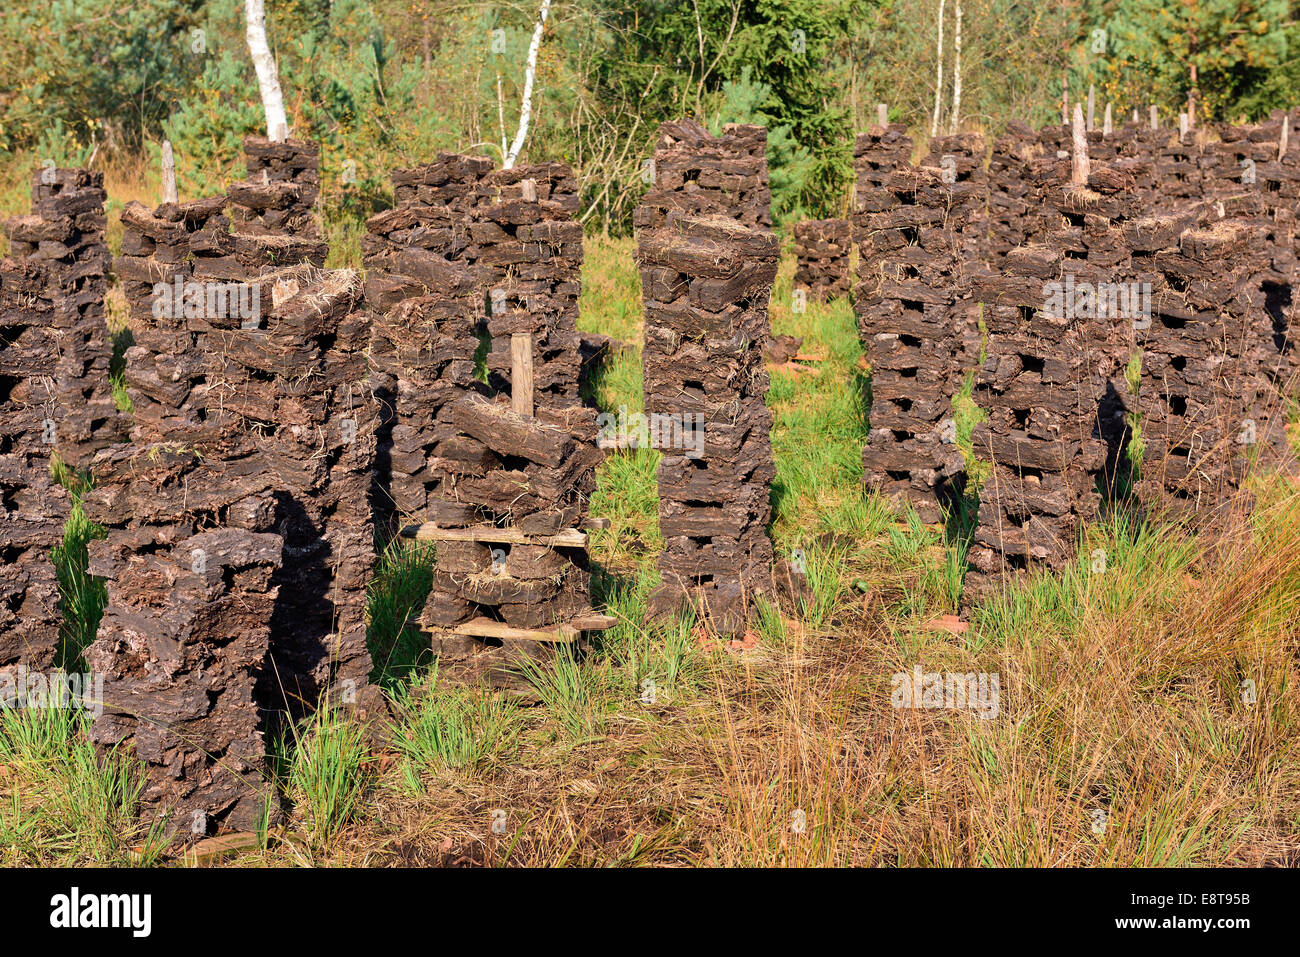 Stacks of peat sods left or drying in the traditional manner, Grundbeckenmoor Rosenheim, near Raubling, Upper Bavaria, - Stock Image